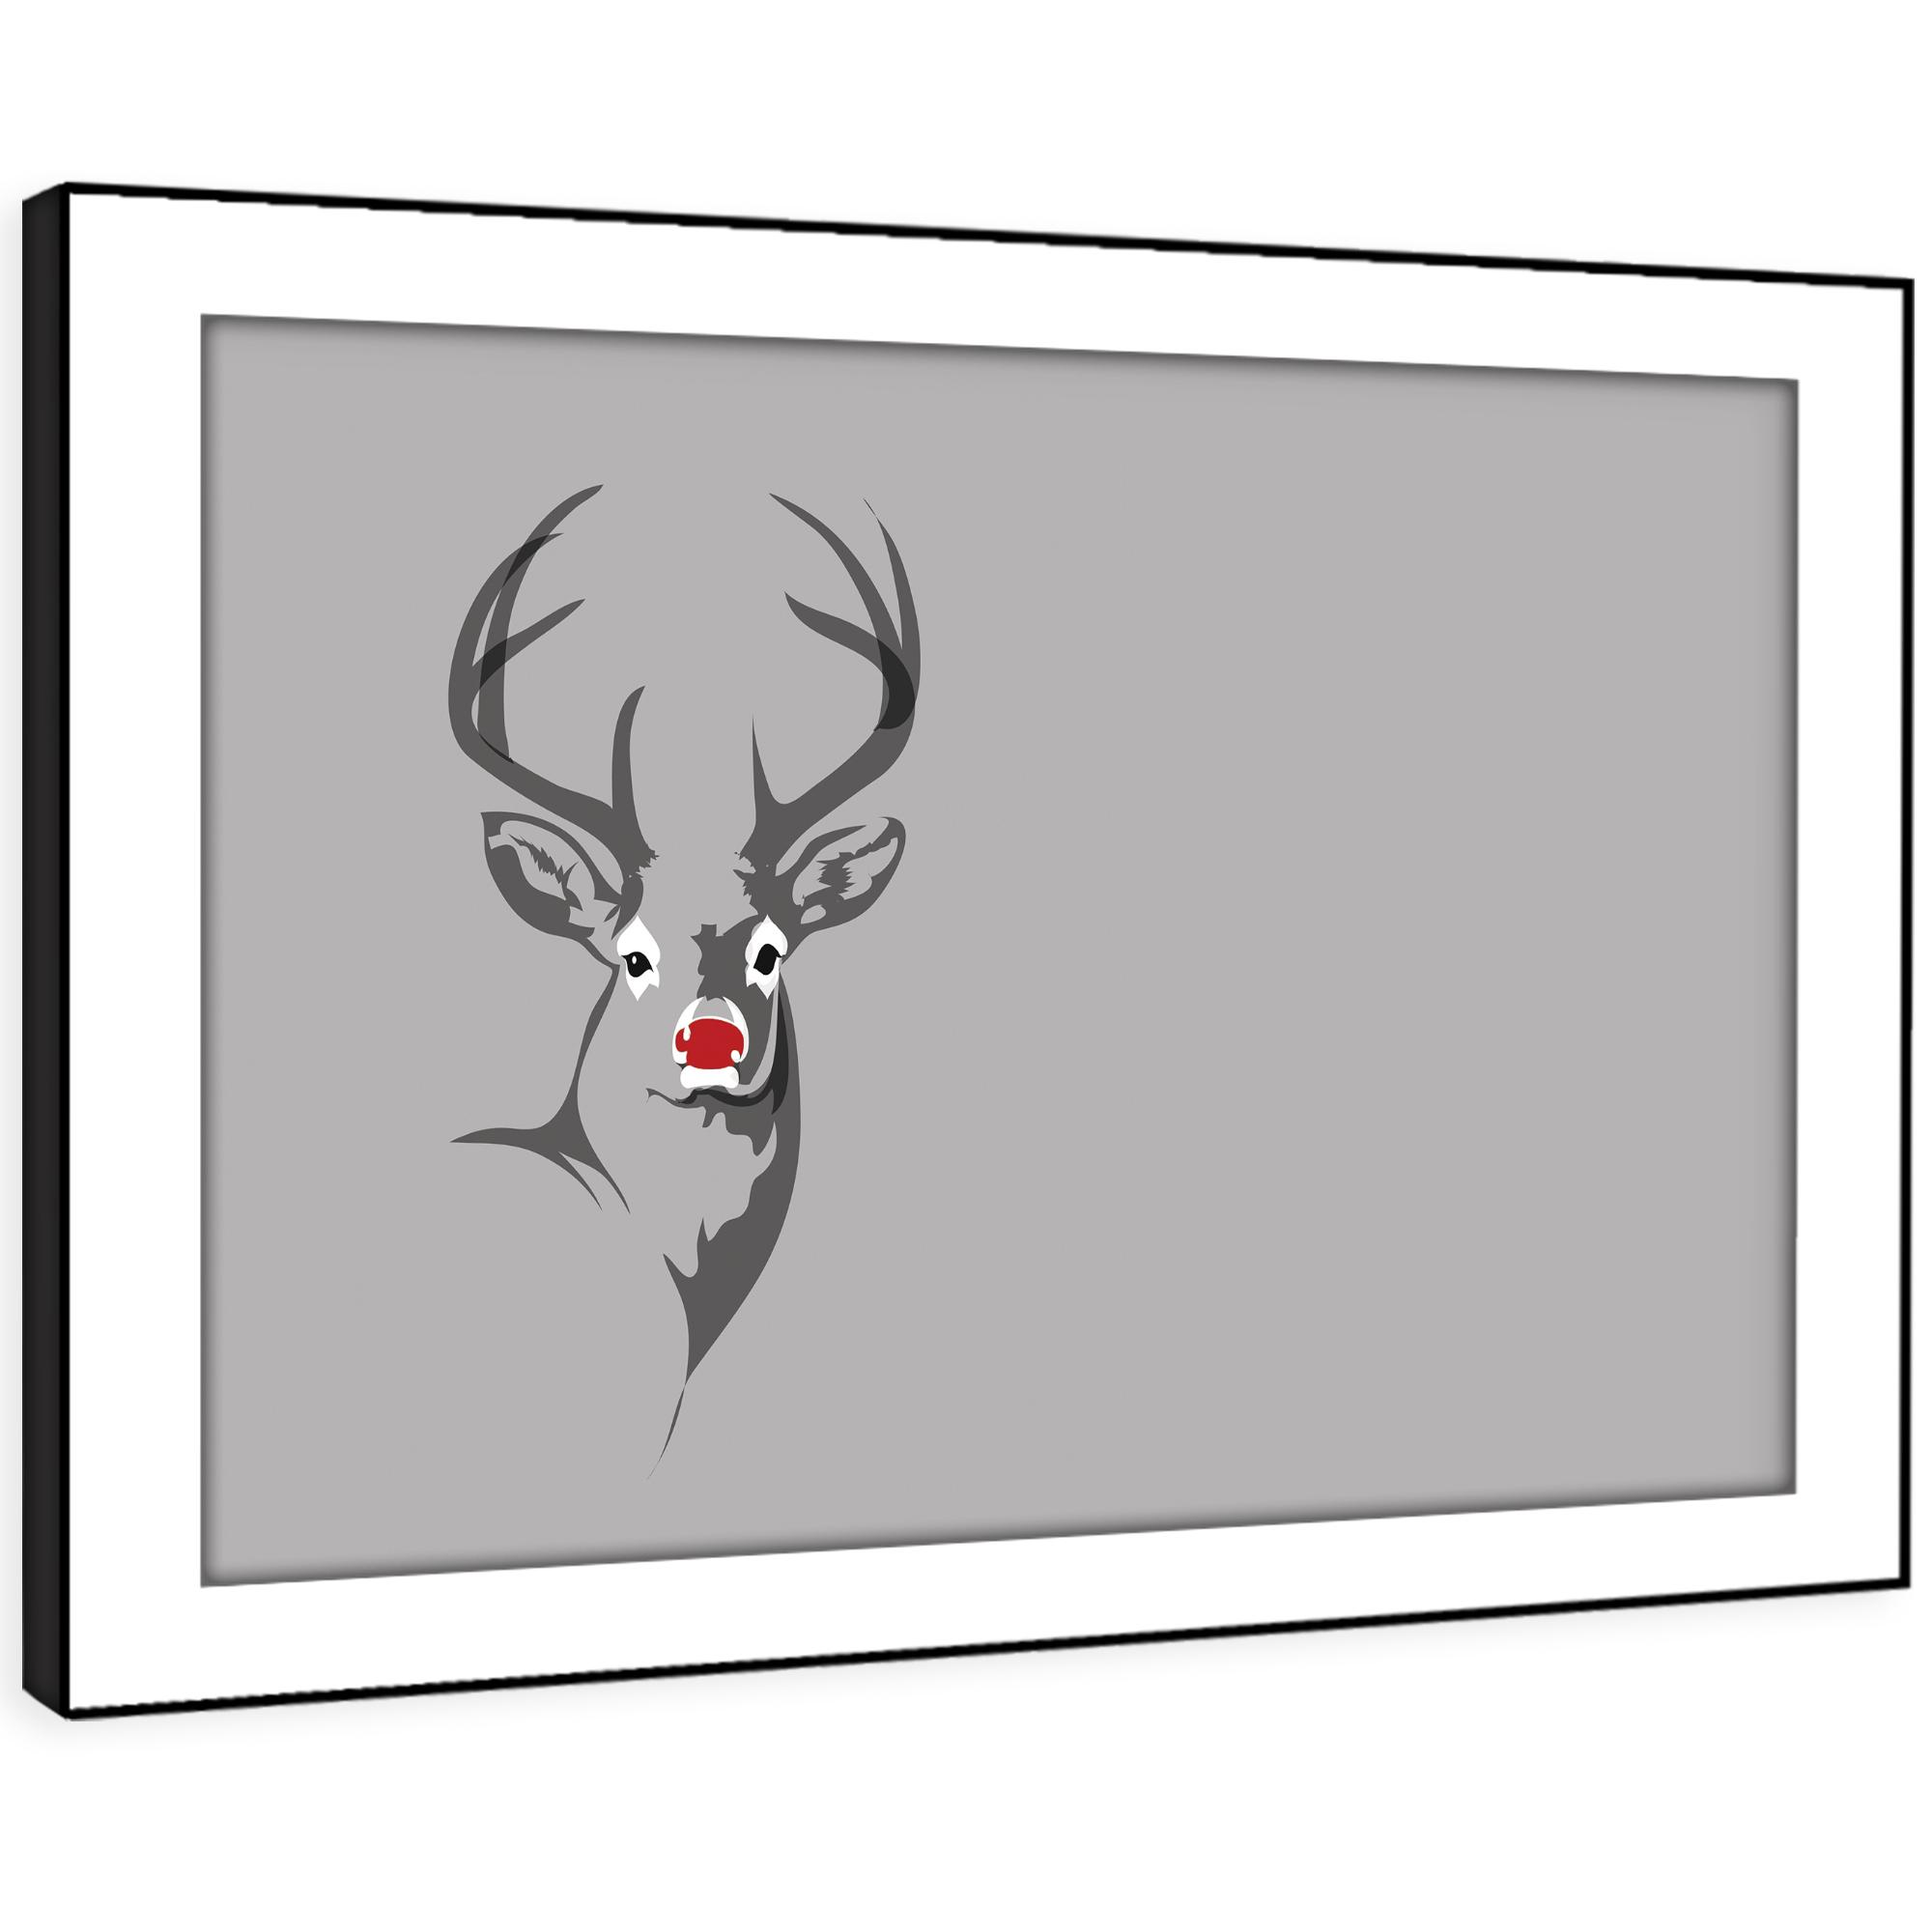 A482 grau Stag Deer grau rot Funky Animal Framed Wall Art Large Picture Prints